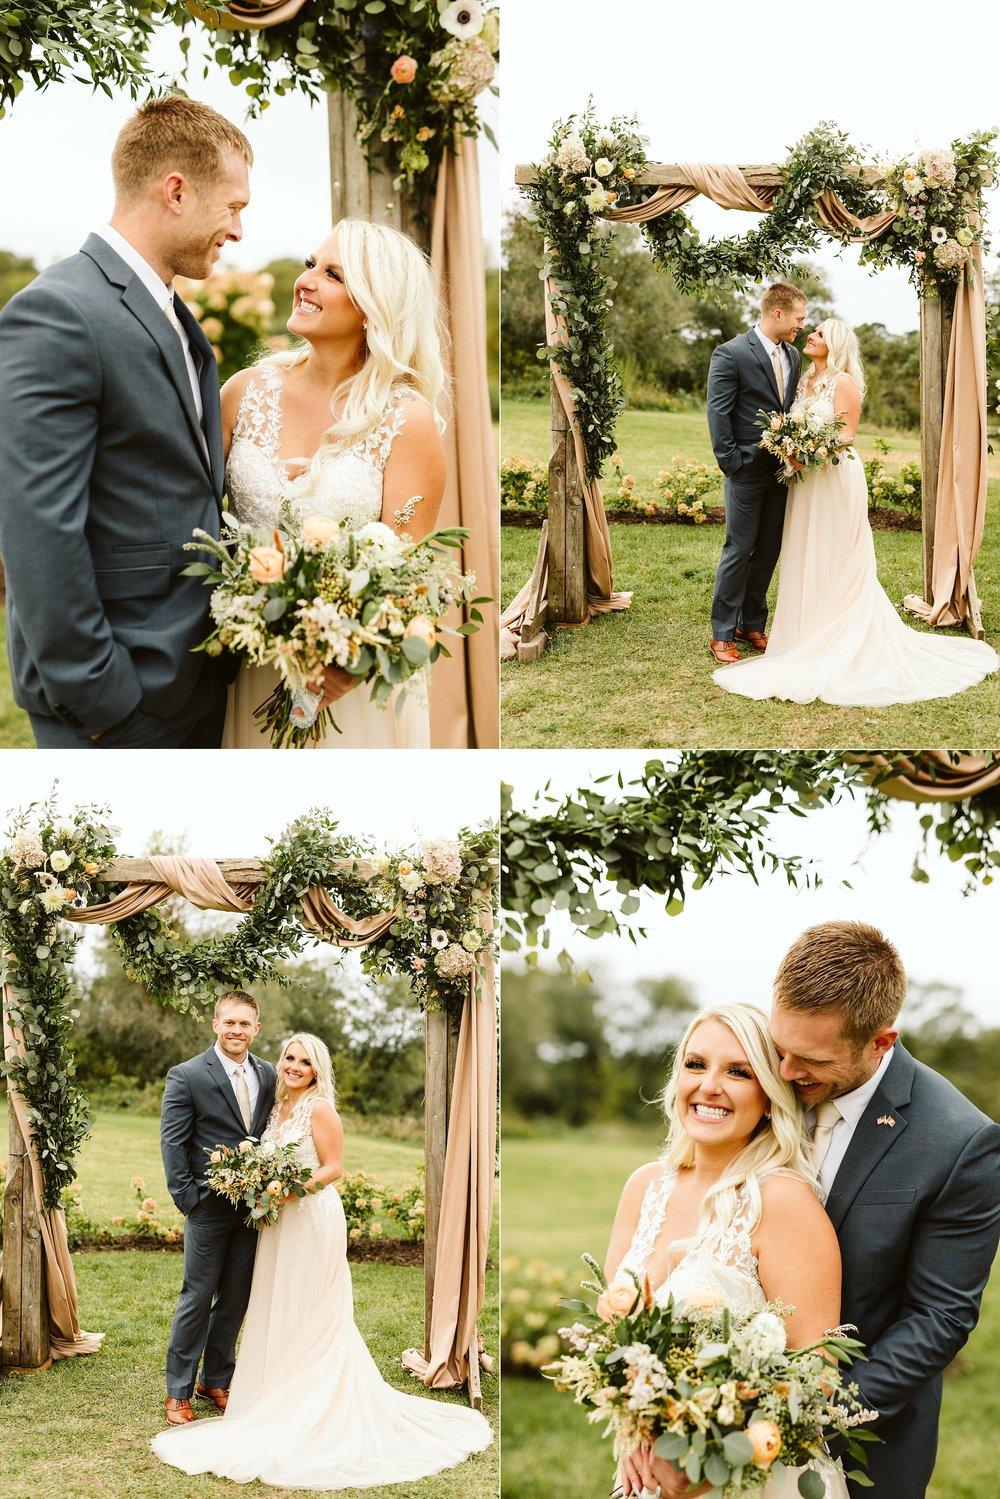 john-p-furber-farm-wedding-in-september-blush-and-floral-70.jpg